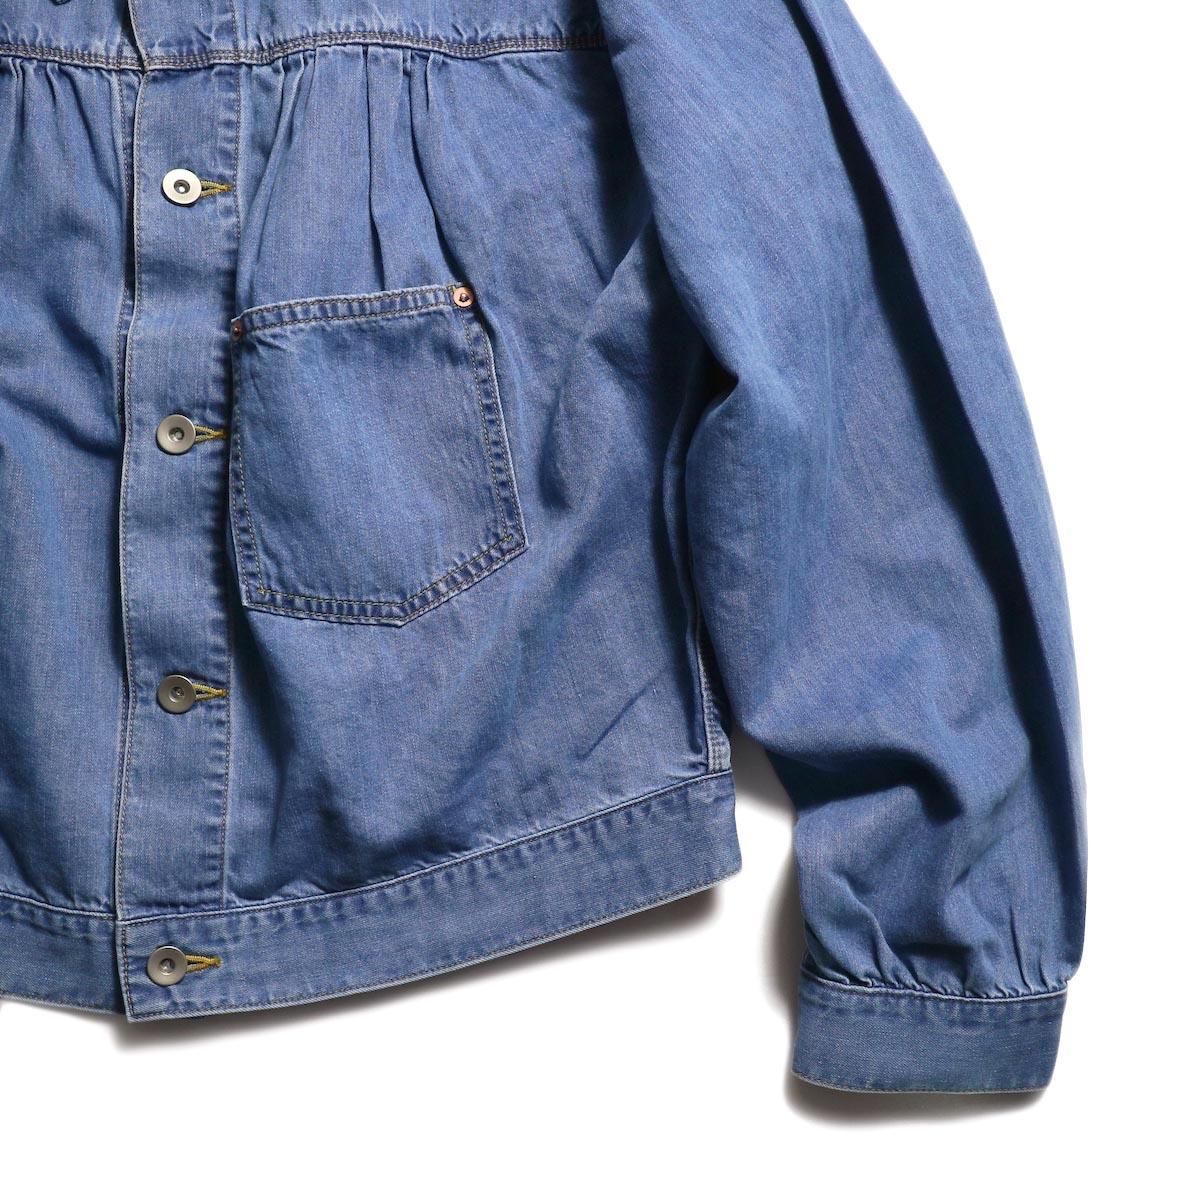 NEEDLES / Gathered Jean Jacket -7oz c/t denim ポケット